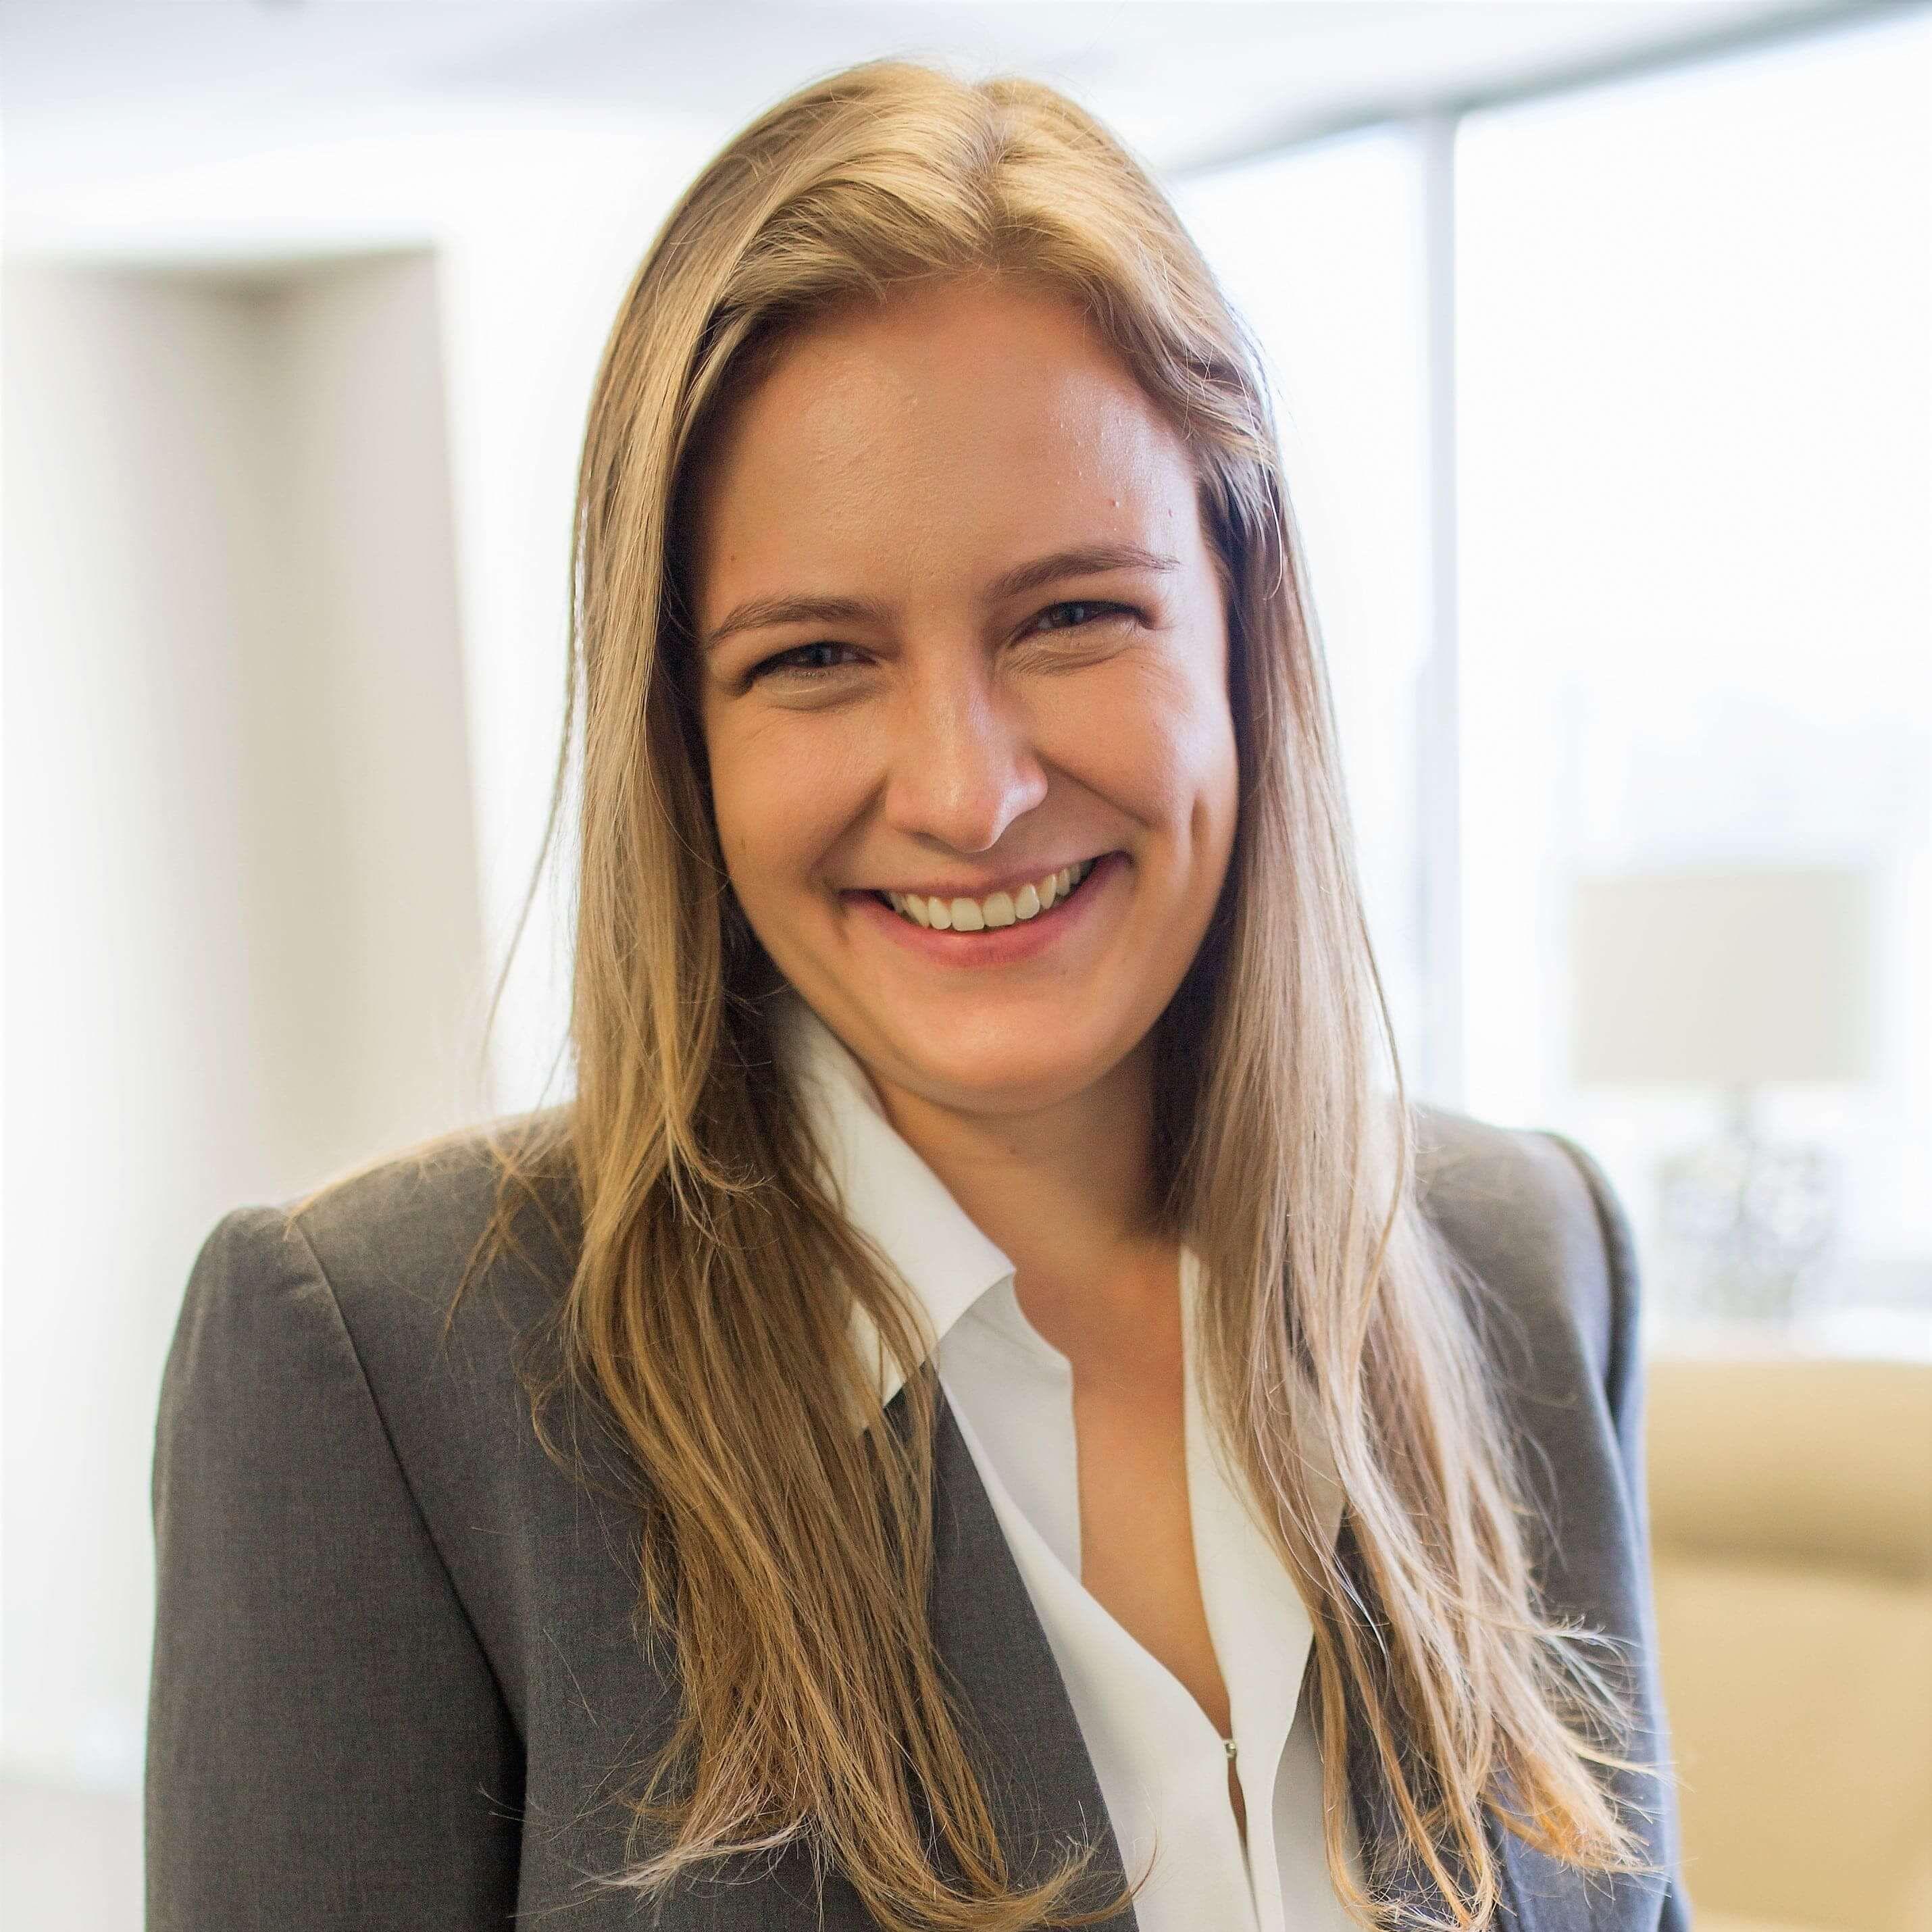 Spanish Speaking Lawyer in Canada - Natalia Bialkowska